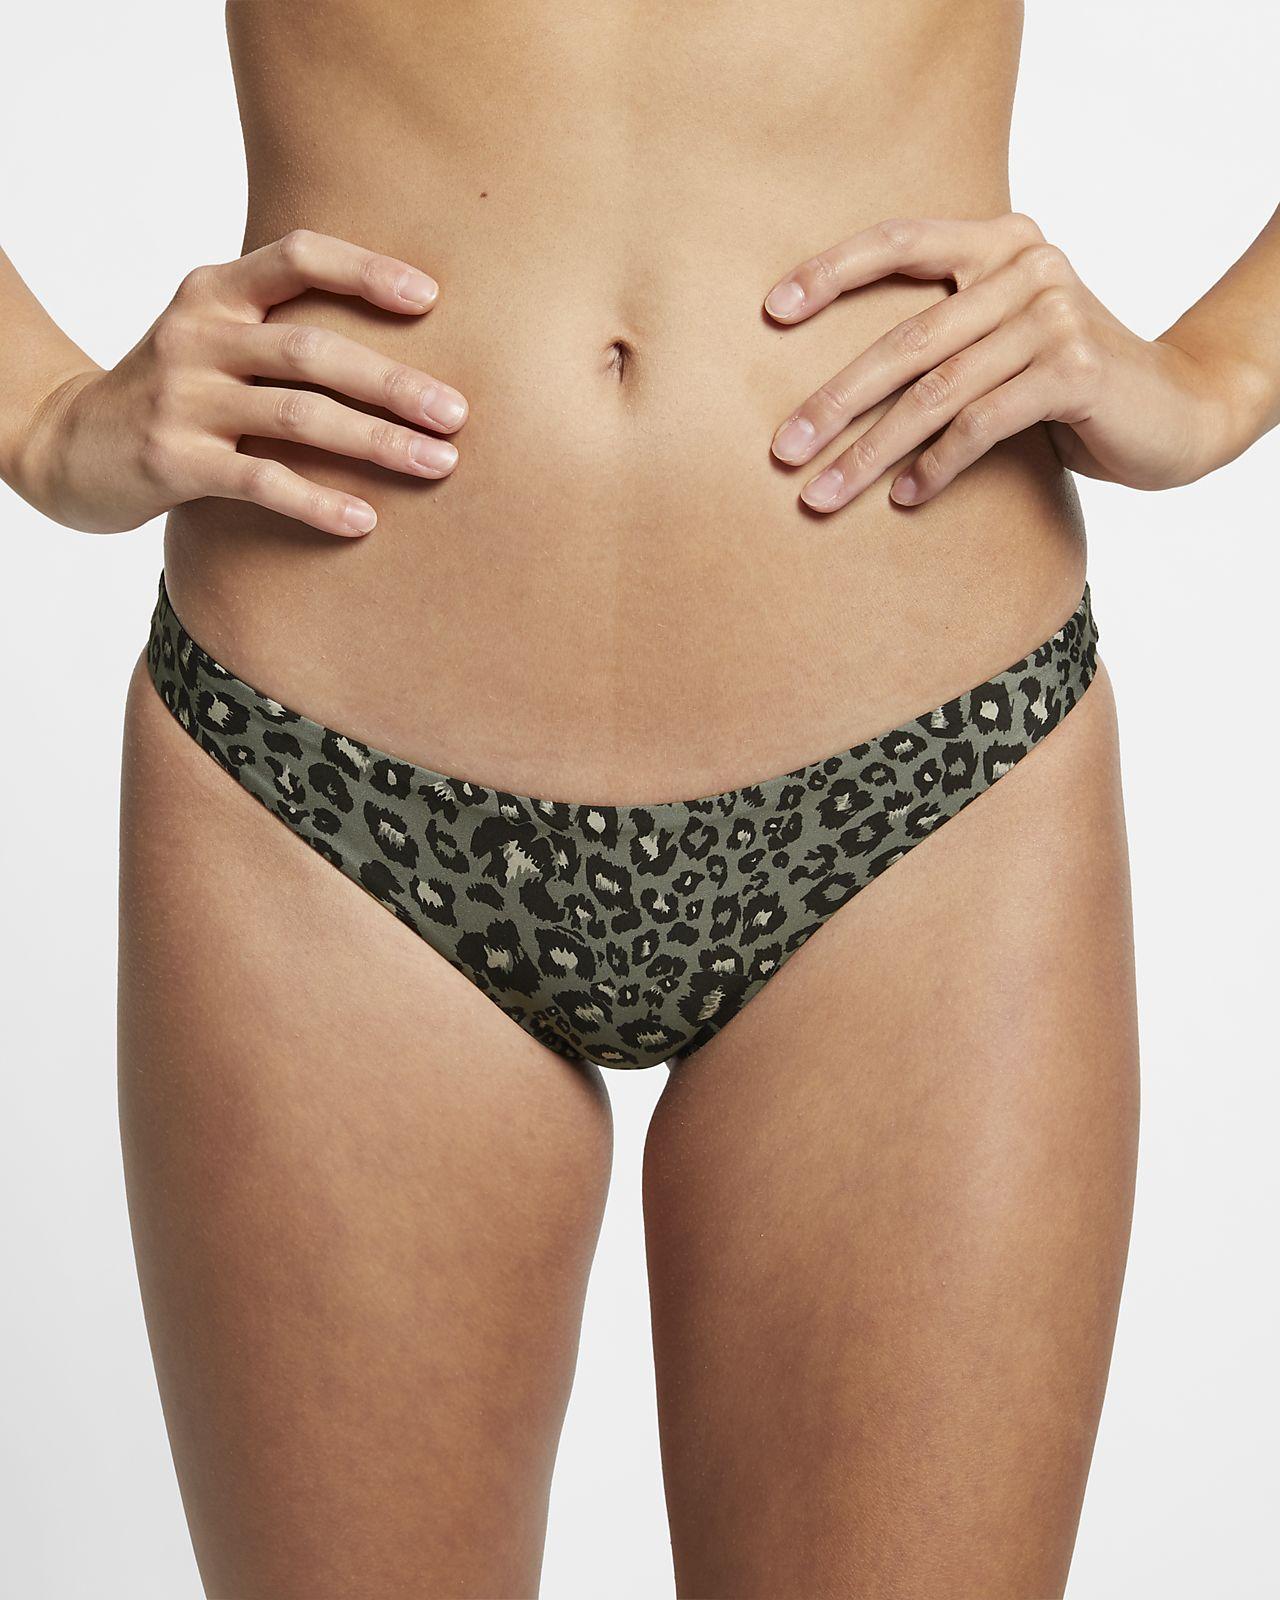 Hurley Quick Dry Damen-Surfhose mit Leopardenprint